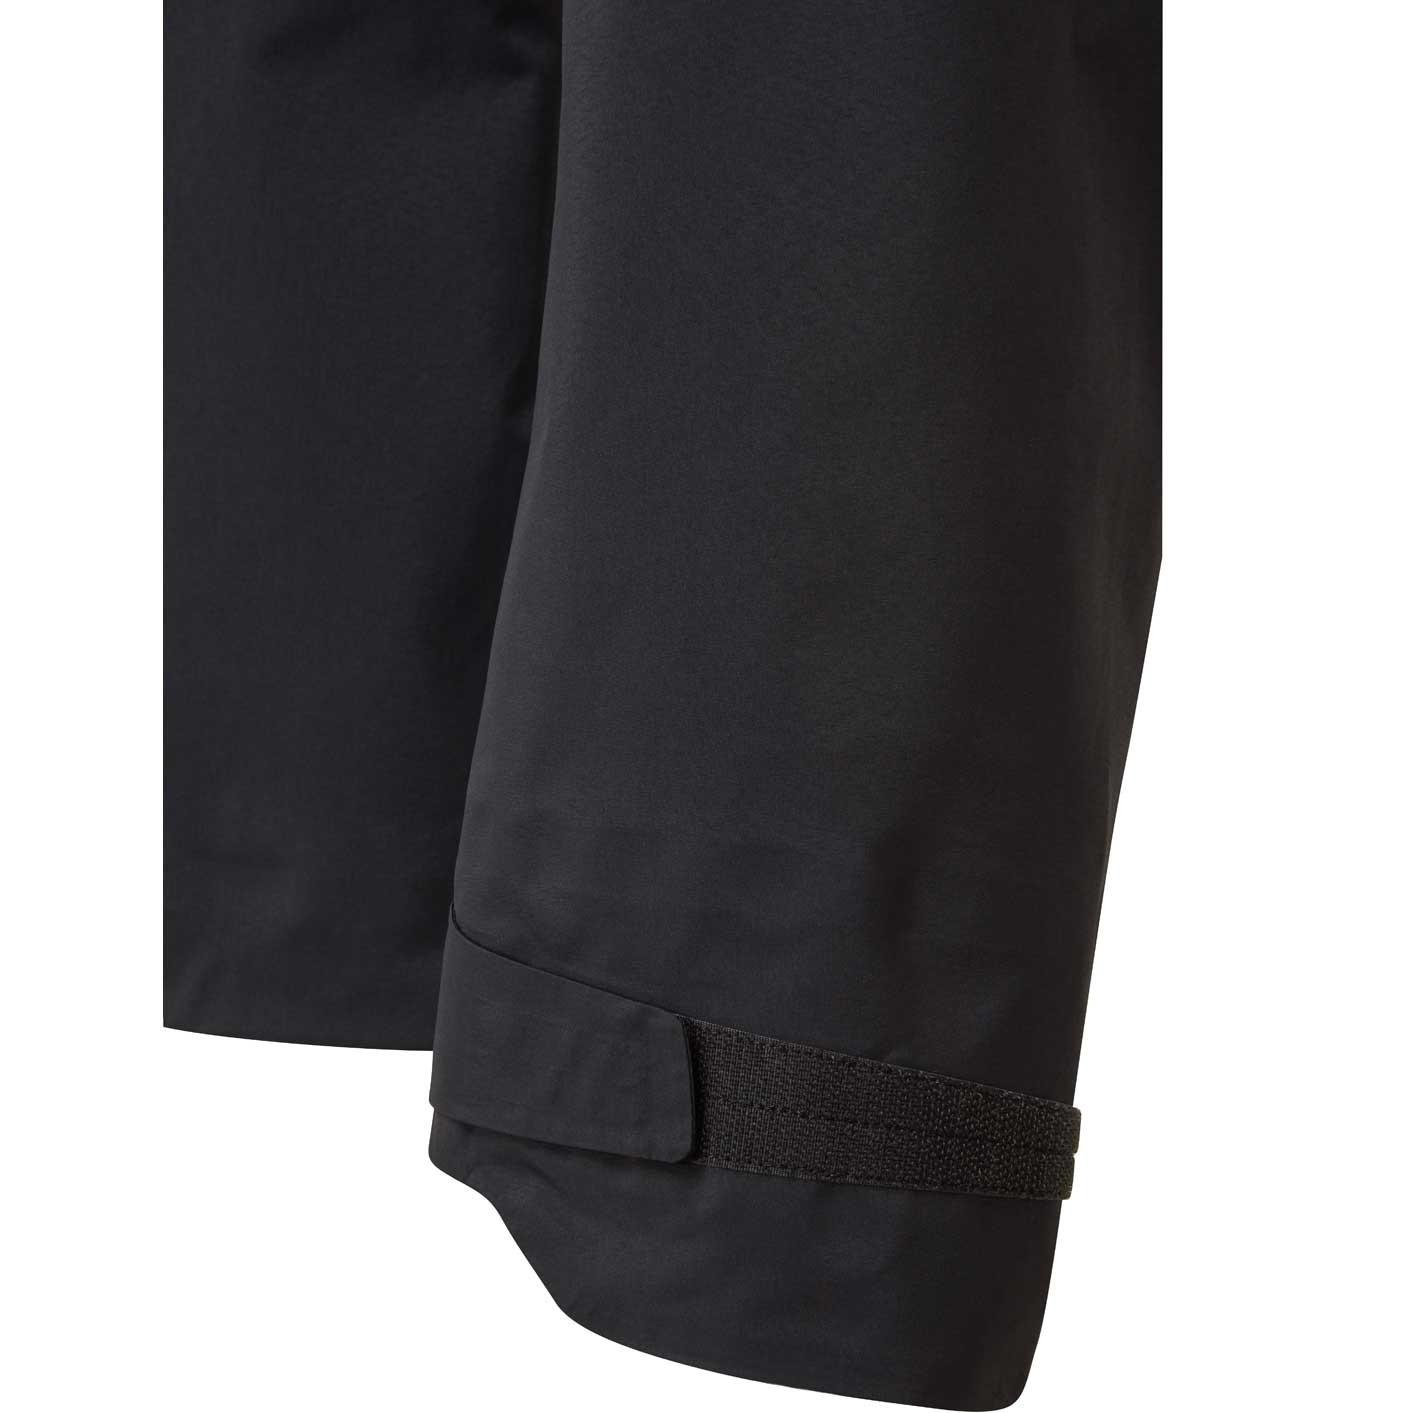 Rab Muztag GTX Waterproof Jacket - Men's - Black